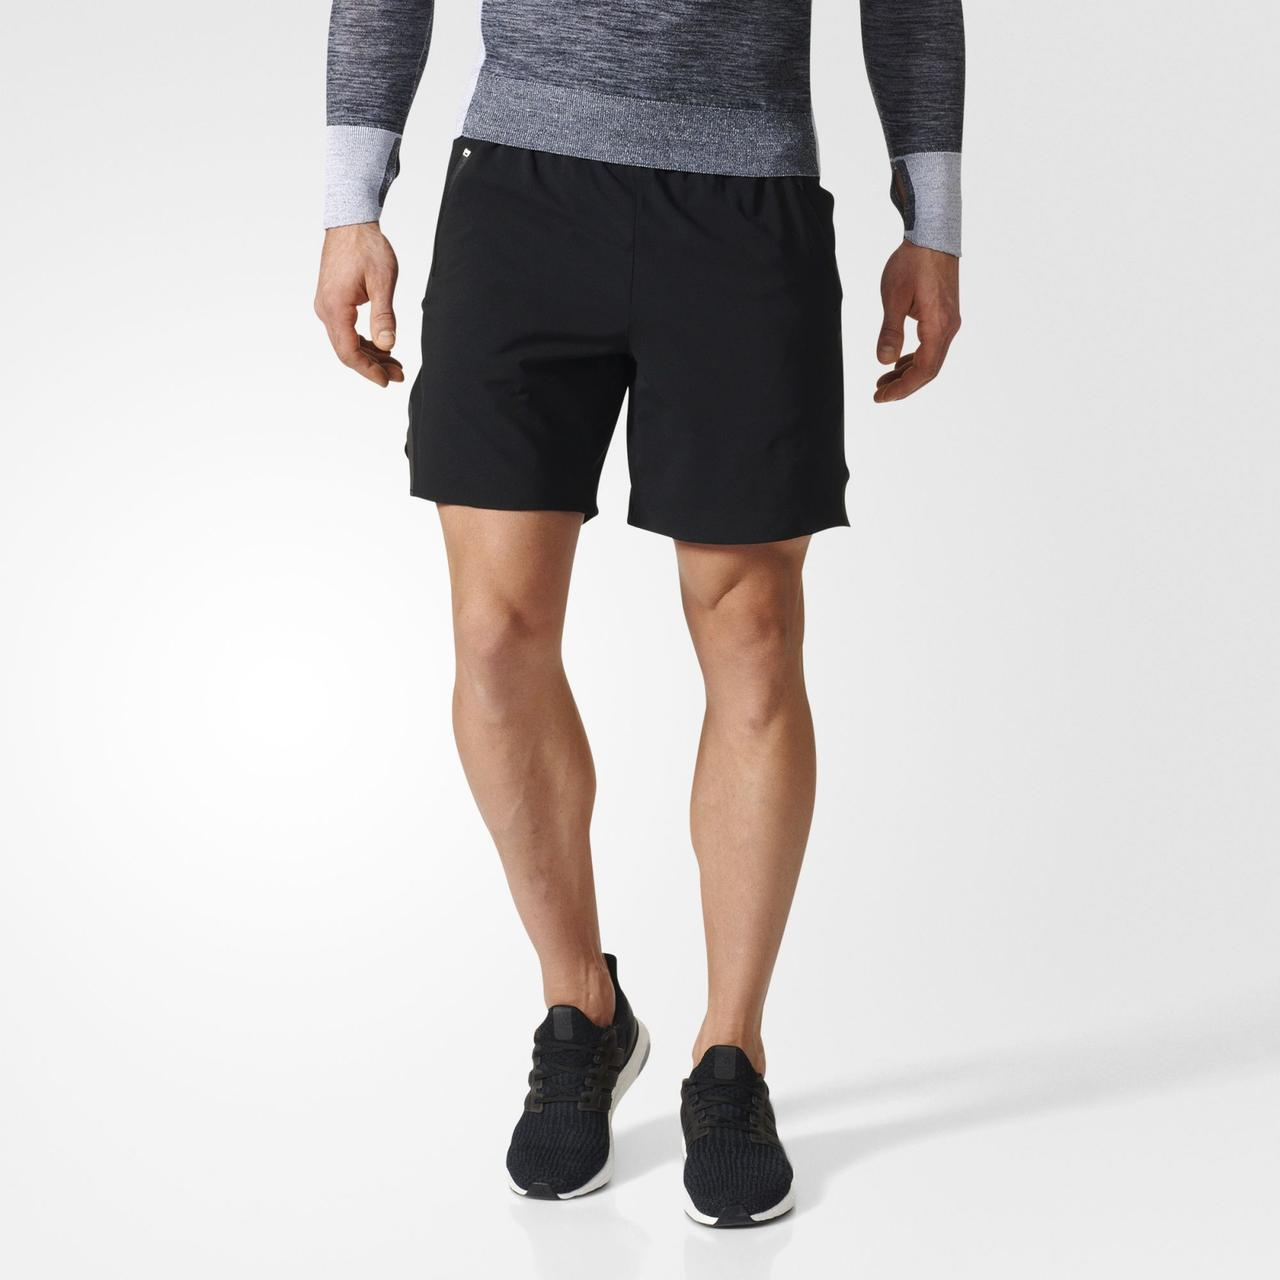 4d03fa7c Мужские Шорты Adidas Performance Ultra Energy Shorts — в Категории